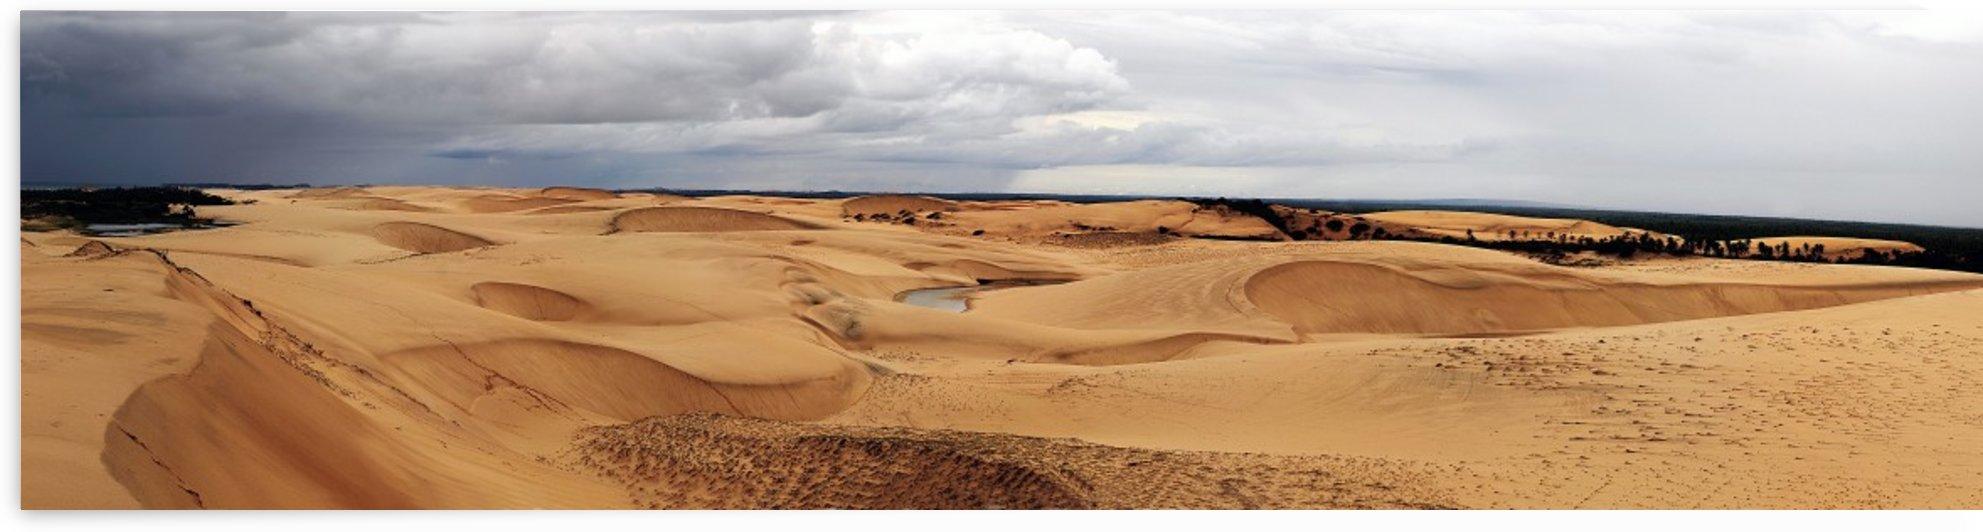 Dunes shorter 01 by Massimo Strino